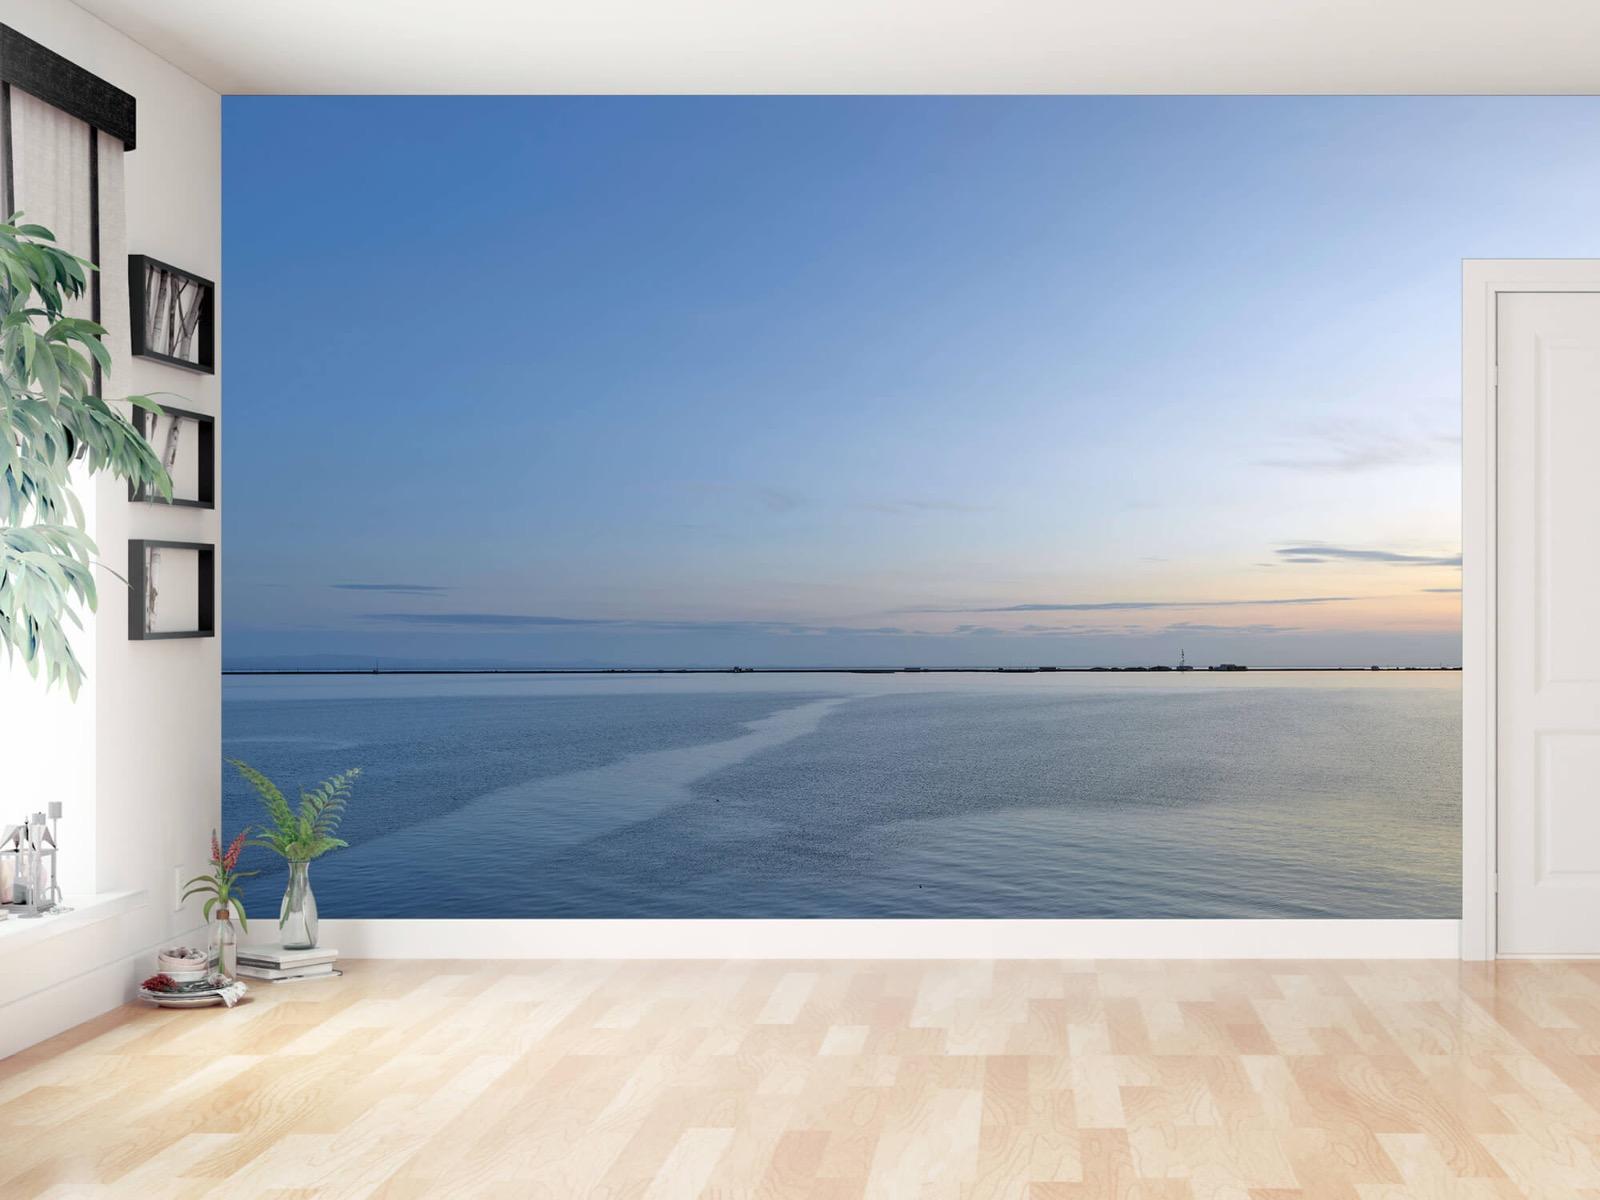 Zeeën en Oceanen - Zee en zonsopkomst - Wallexclusive - Woonkamer 11